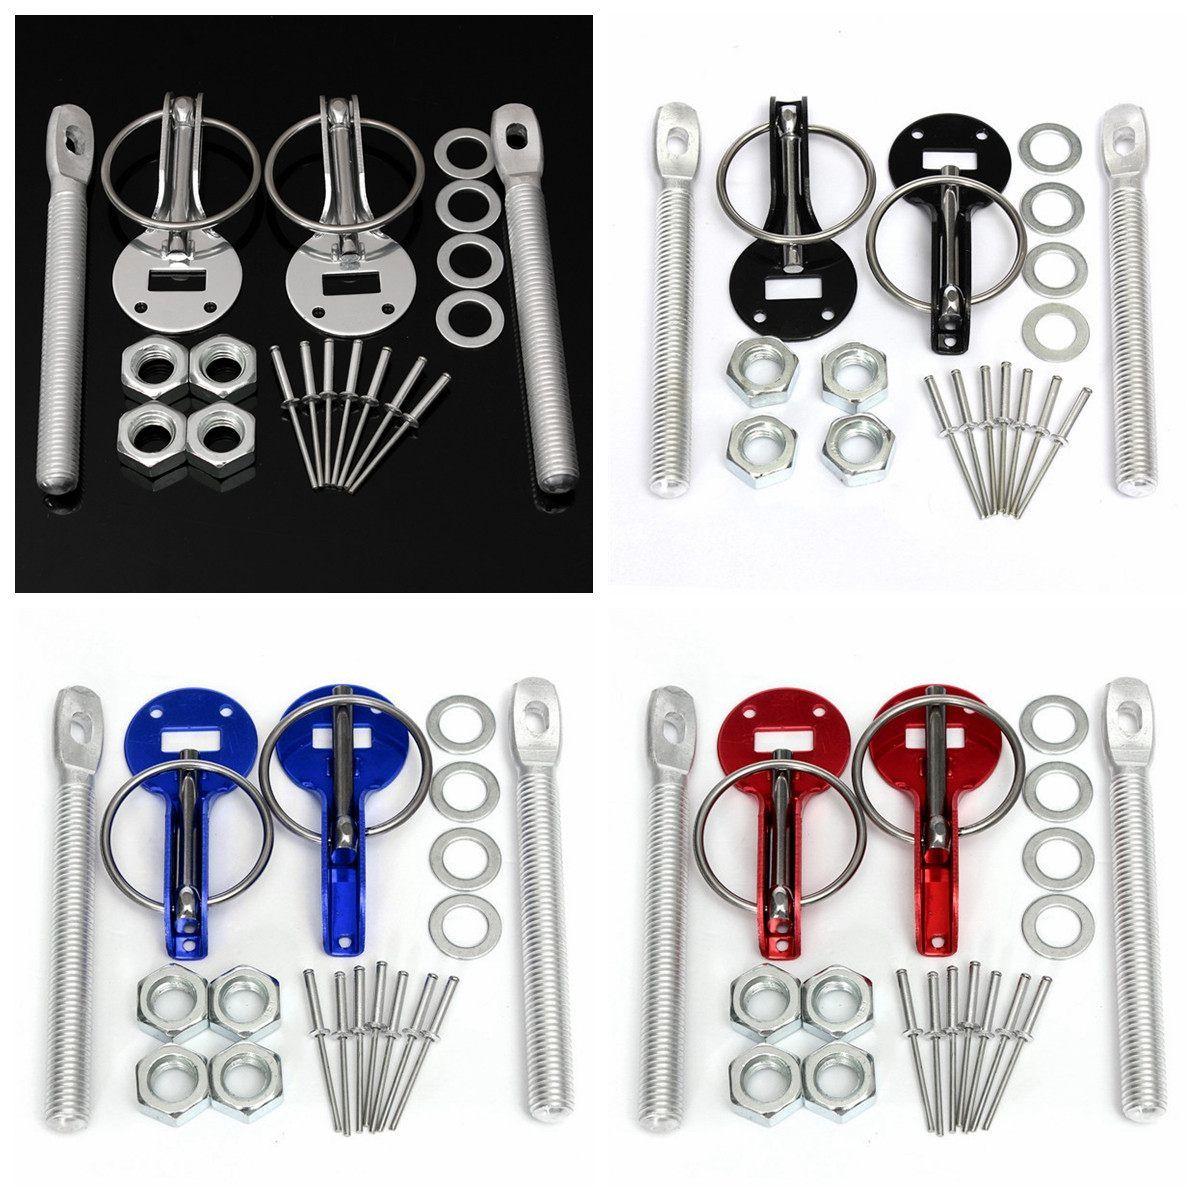 4 color Pair Universal Cars Aluminum Alloy Mount Hood Pin Bonnet Lock Kit Automobile Refitting Kit Car Styling Accessaries